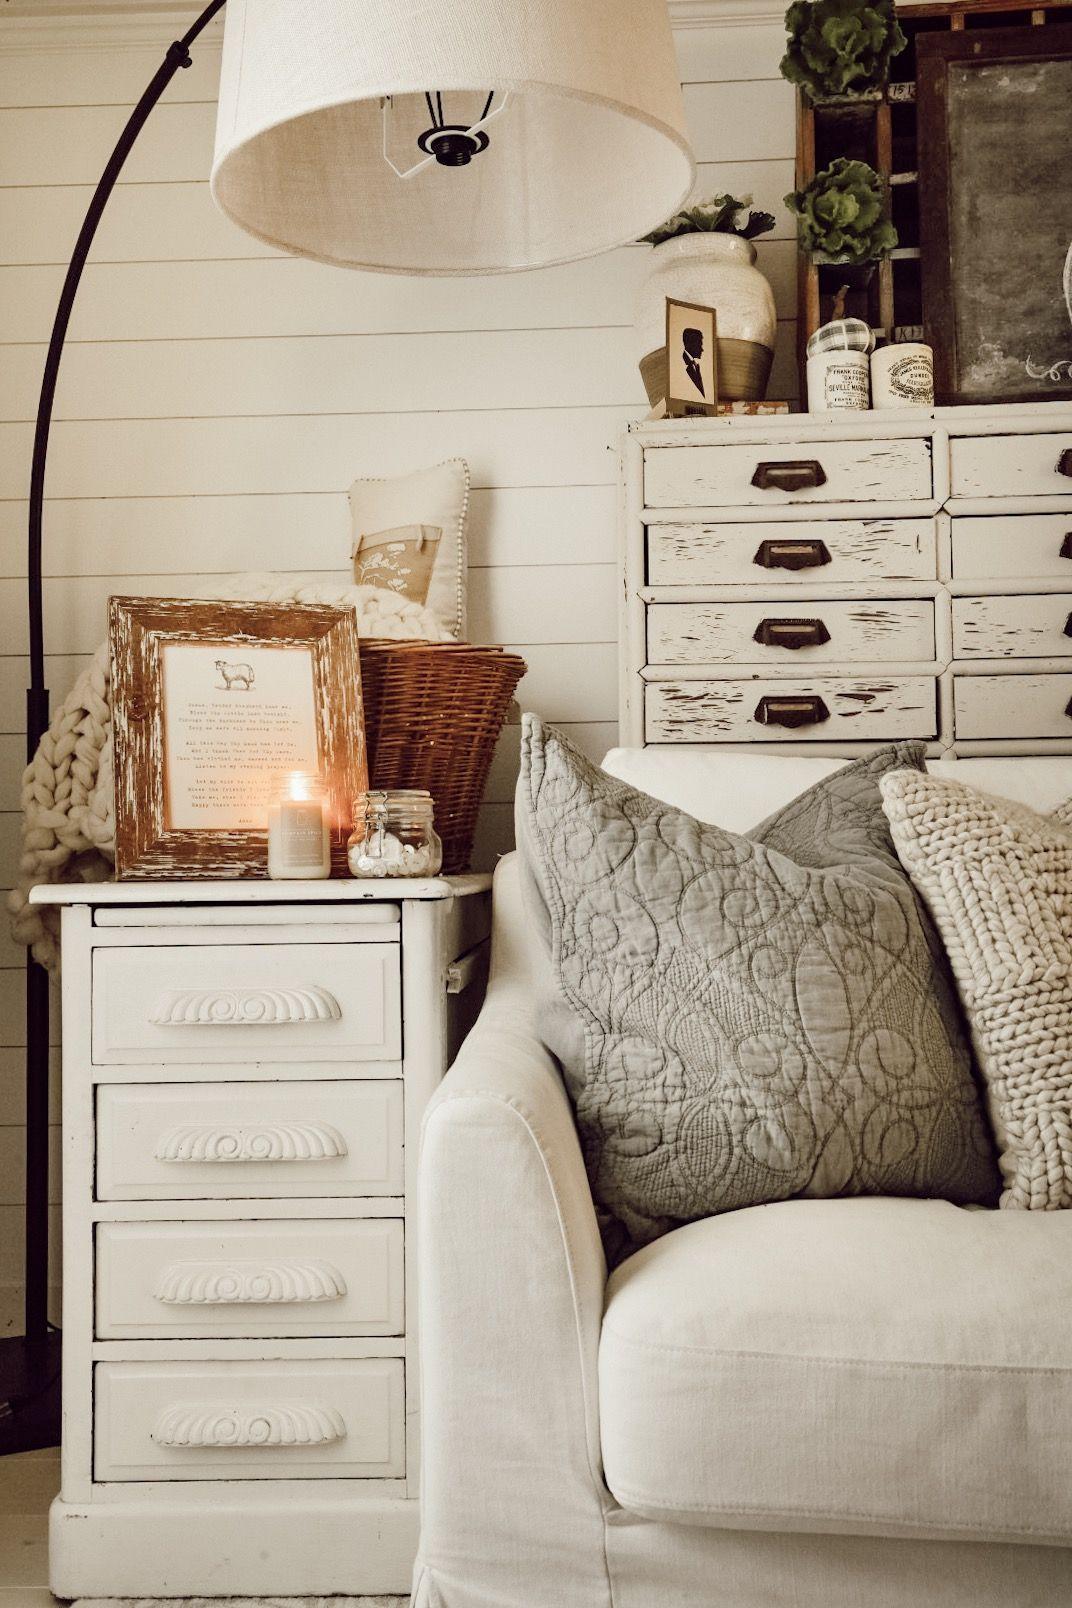 Simple and cozy fall family room. #falldecor #cozy #familyroom #fallinspiration #gather #whitecottage #livingroom #simpledecor #fallfamilyroom #fall #autumn